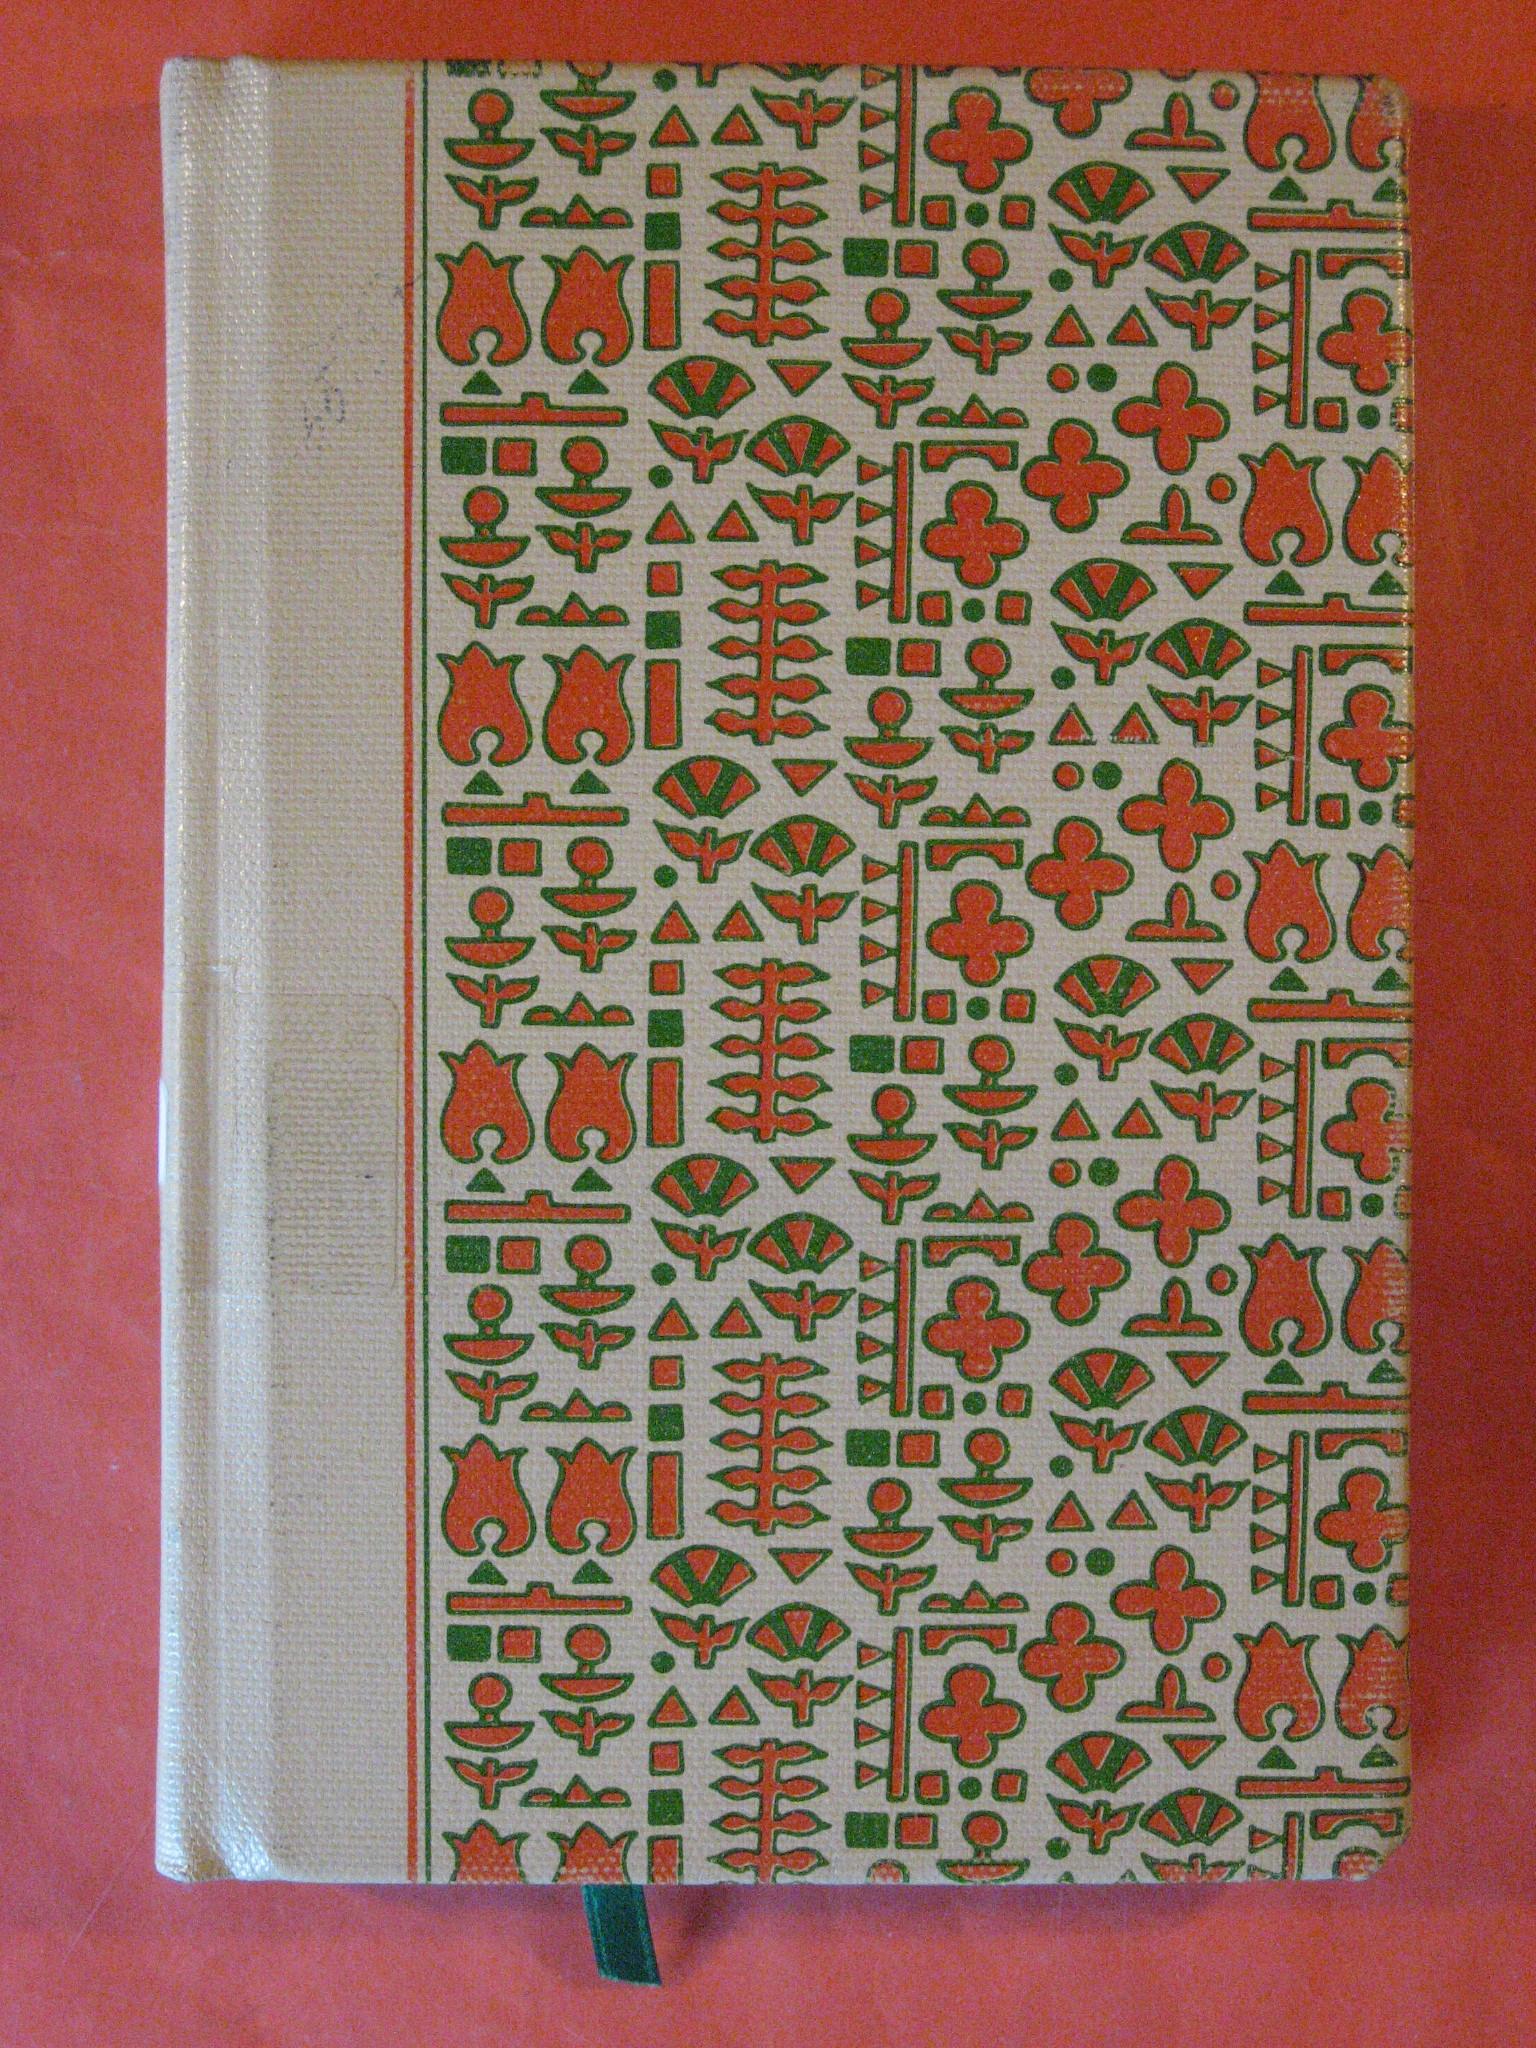 Blank Journal (Raspiataia Rossiia)